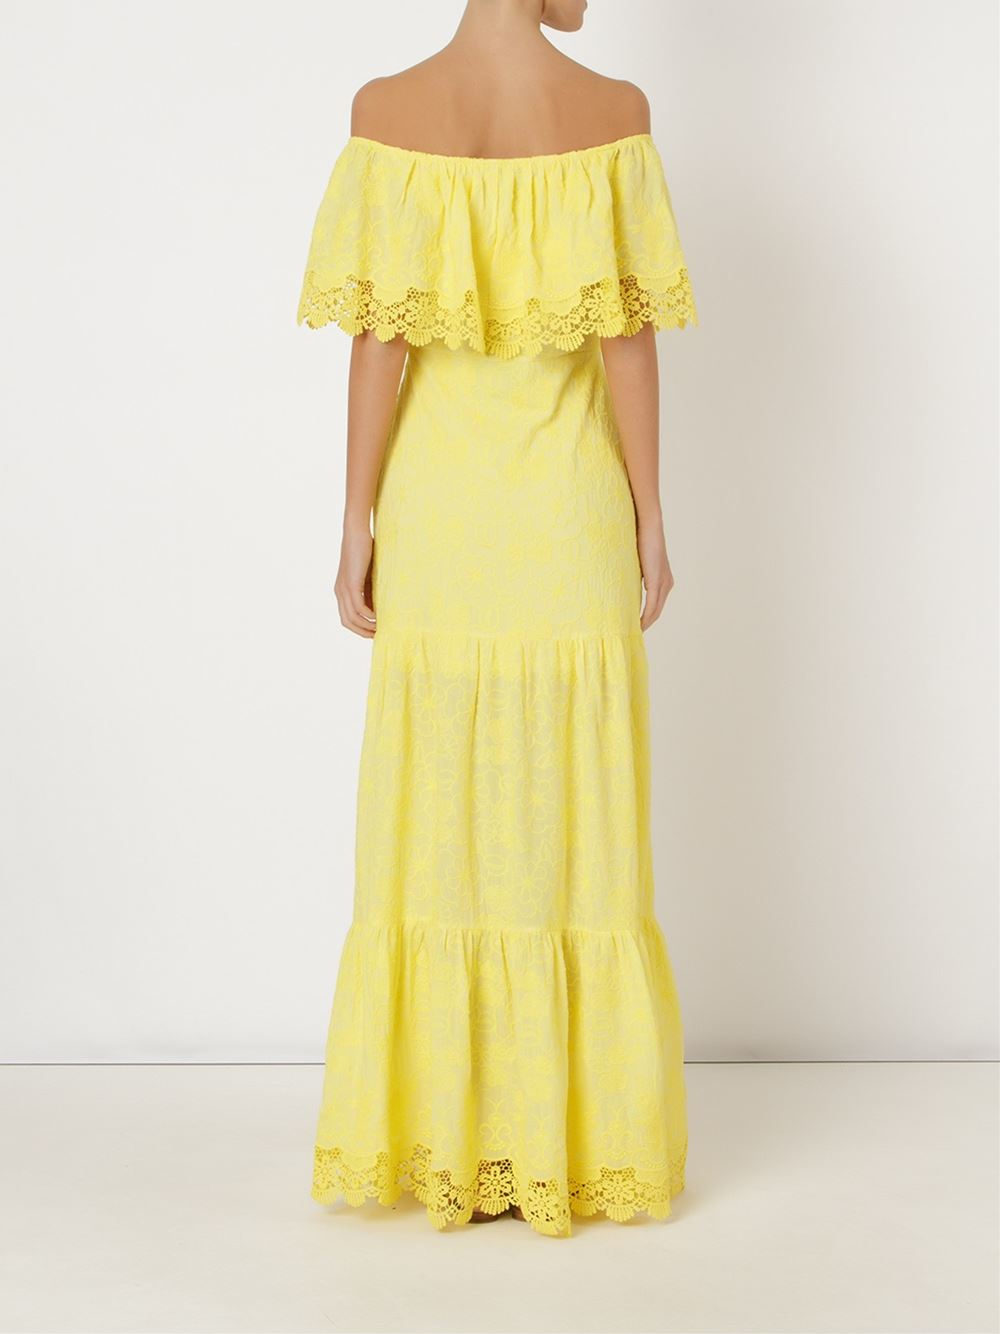 Skinbiquini Ruffled Off-shoulder Maxi Dress in Yellow | Lyst